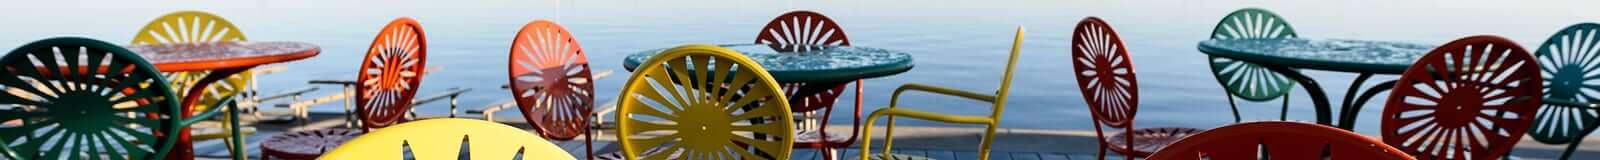 UW–Madison Memorial Union's famous starburst chairs